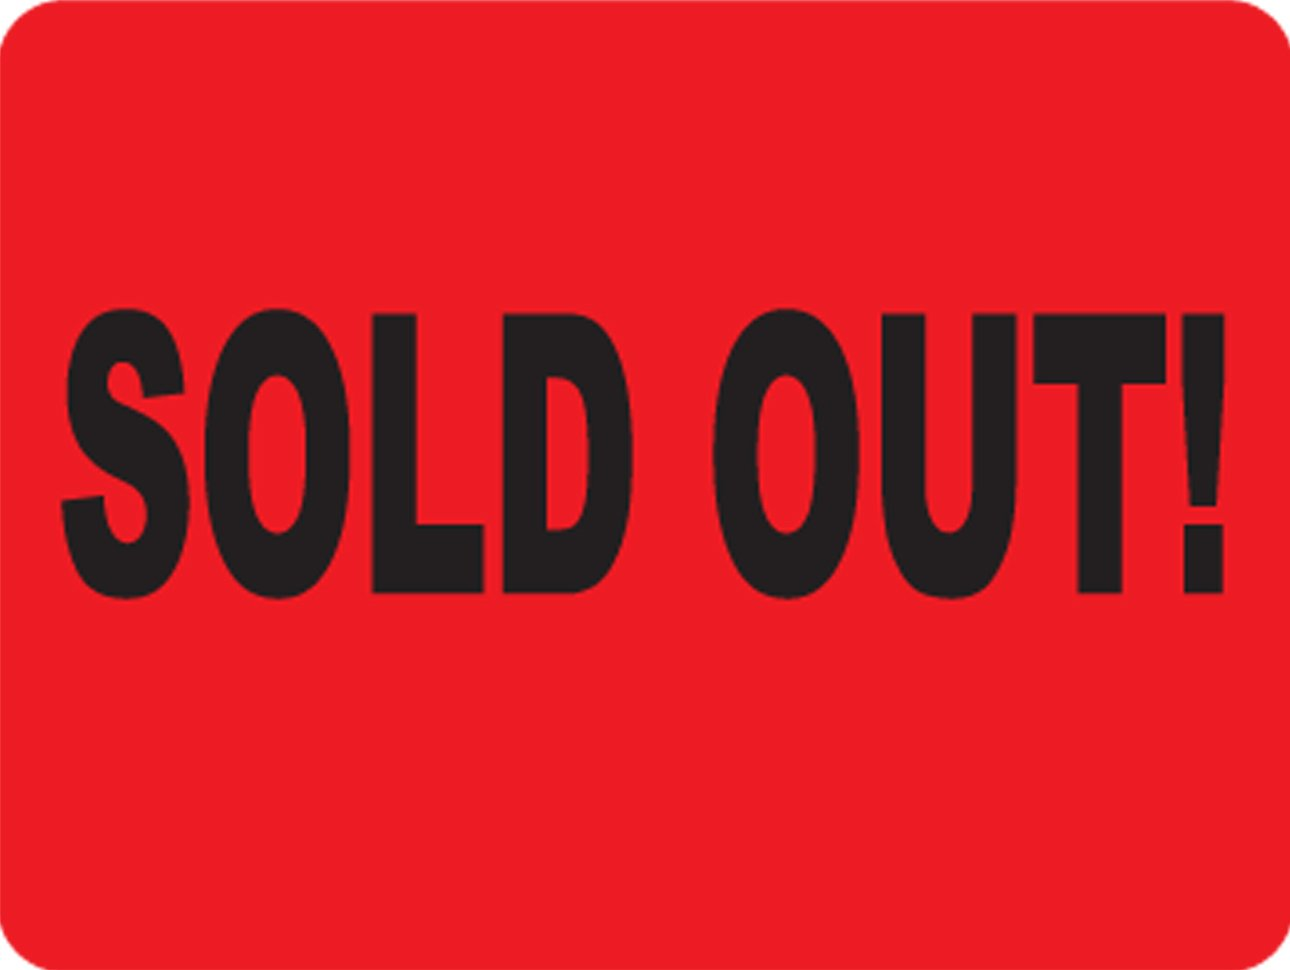 Sold Out! Labels. 5,000 Labels. PromoTouch Compatible